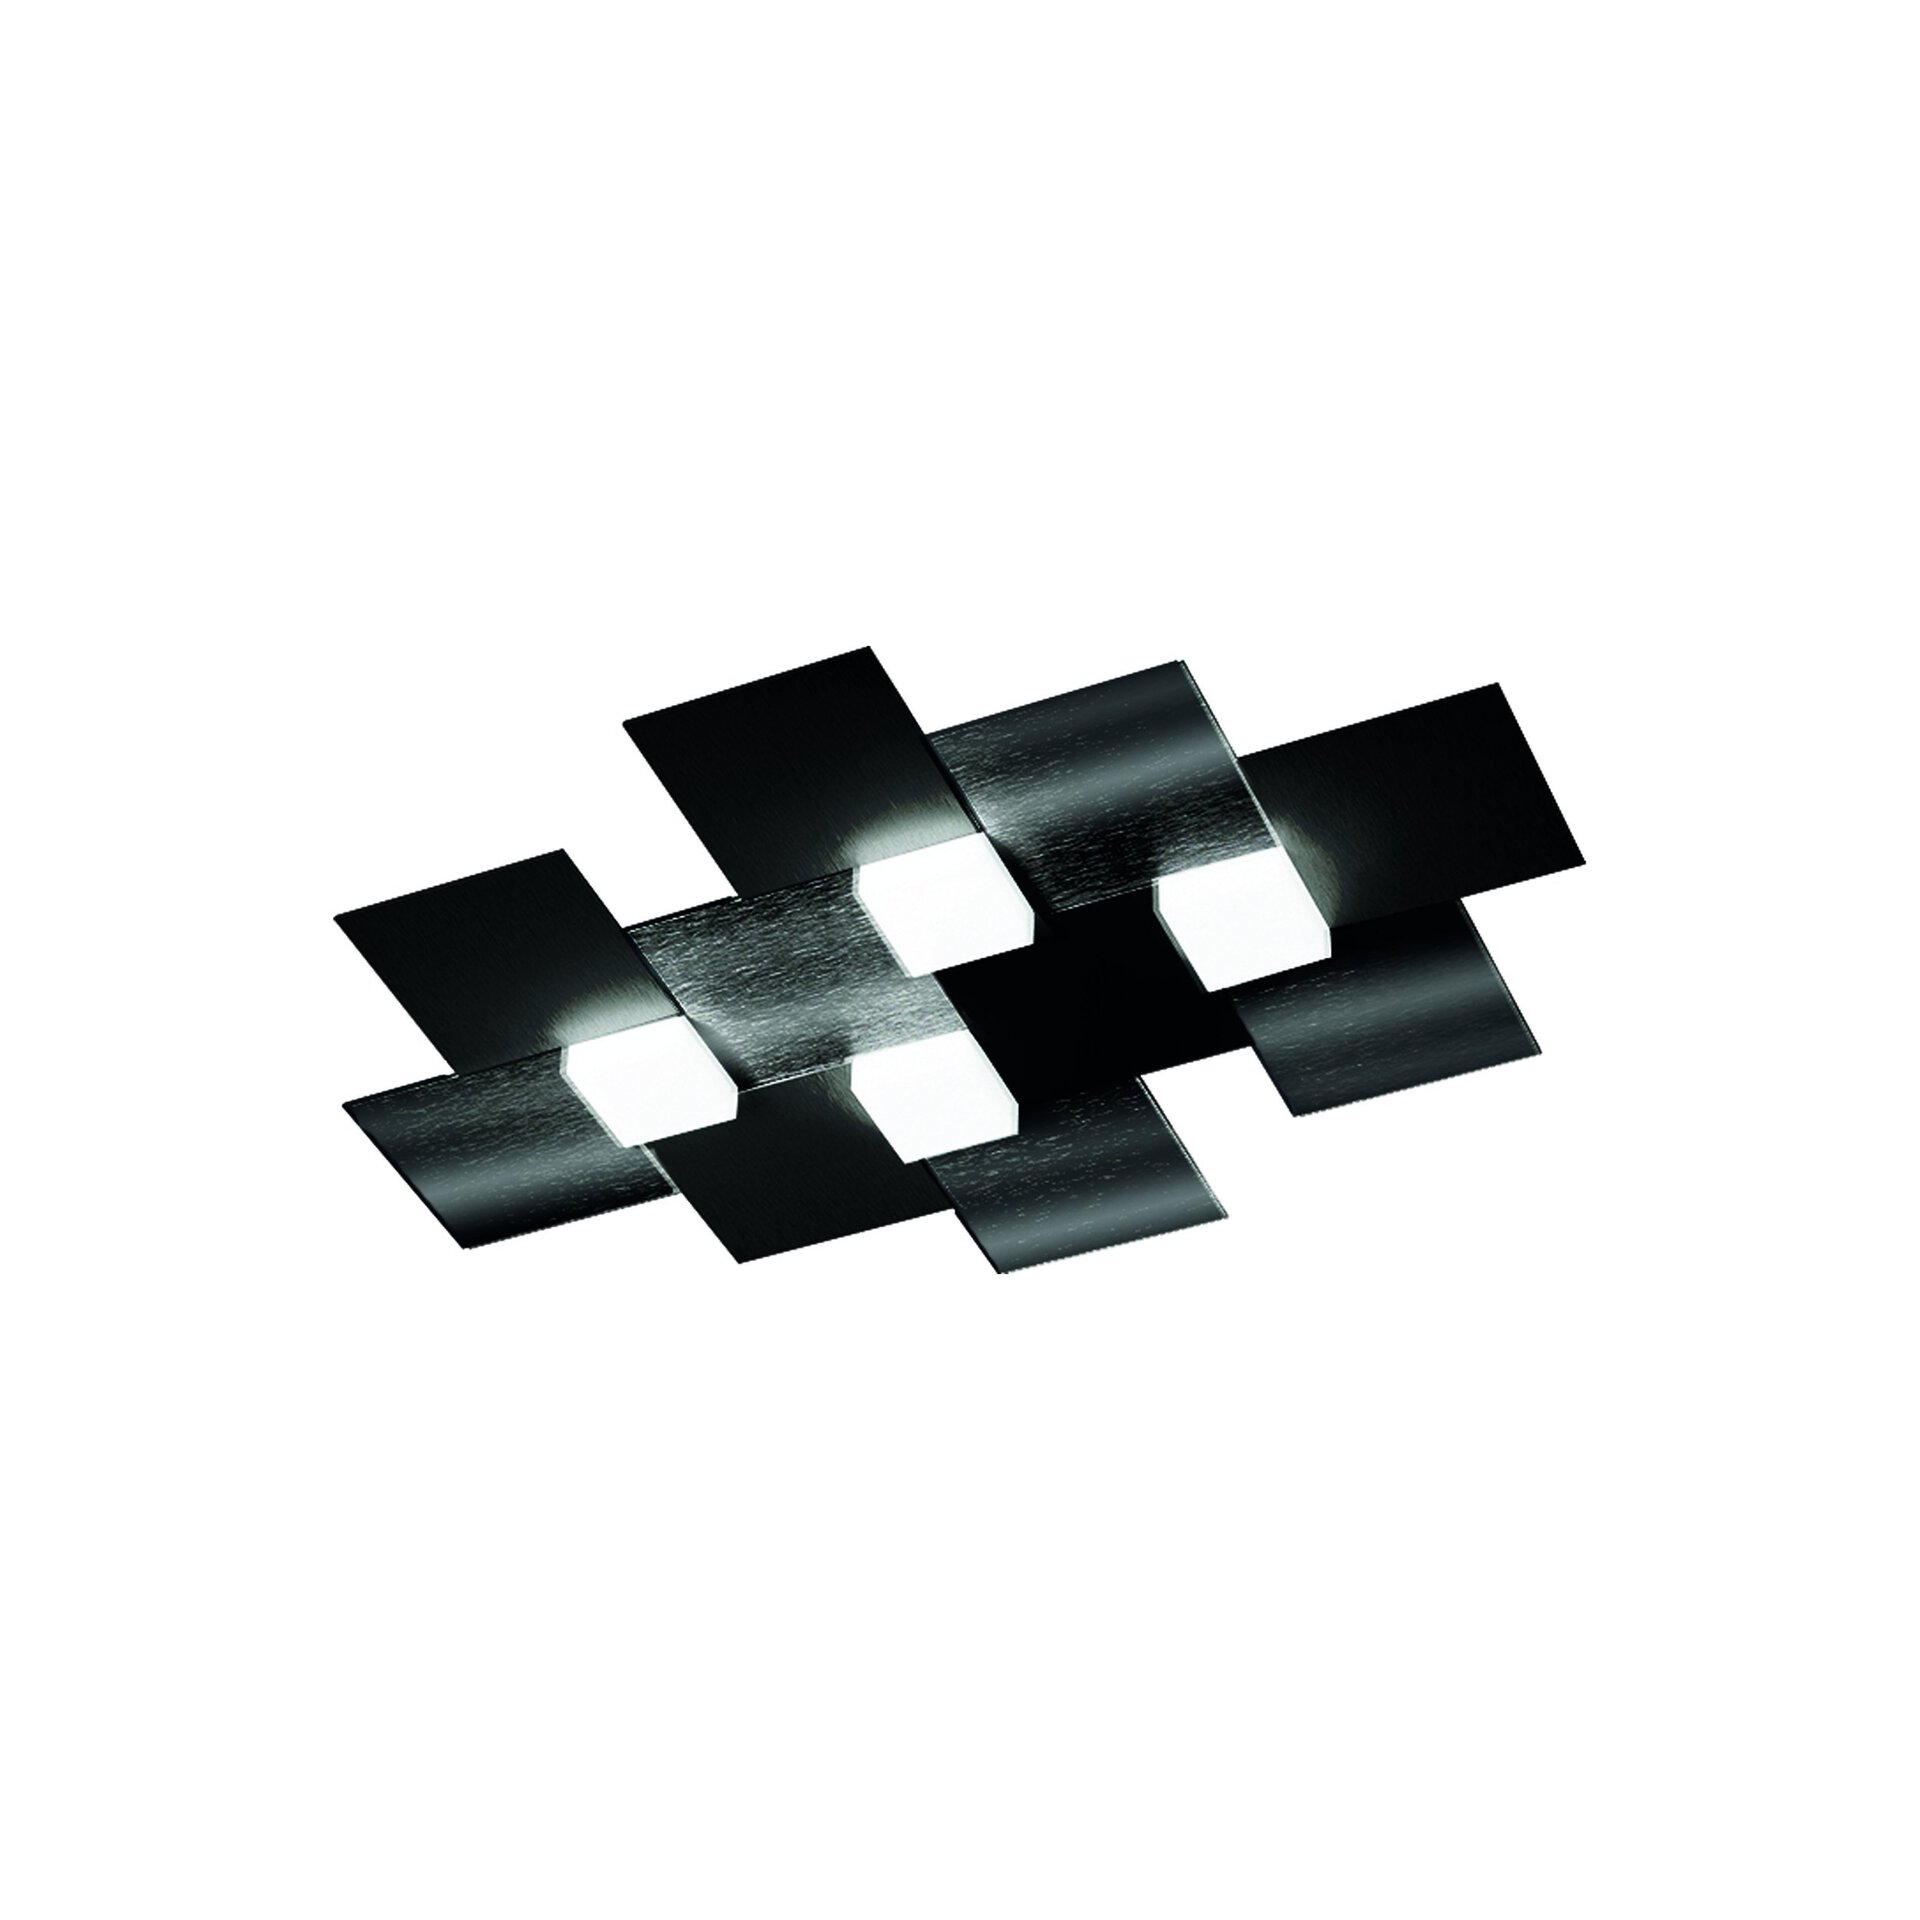 Deckenleuchte creo Grossmann Metall schwarz 39 x 5 x 55 cm